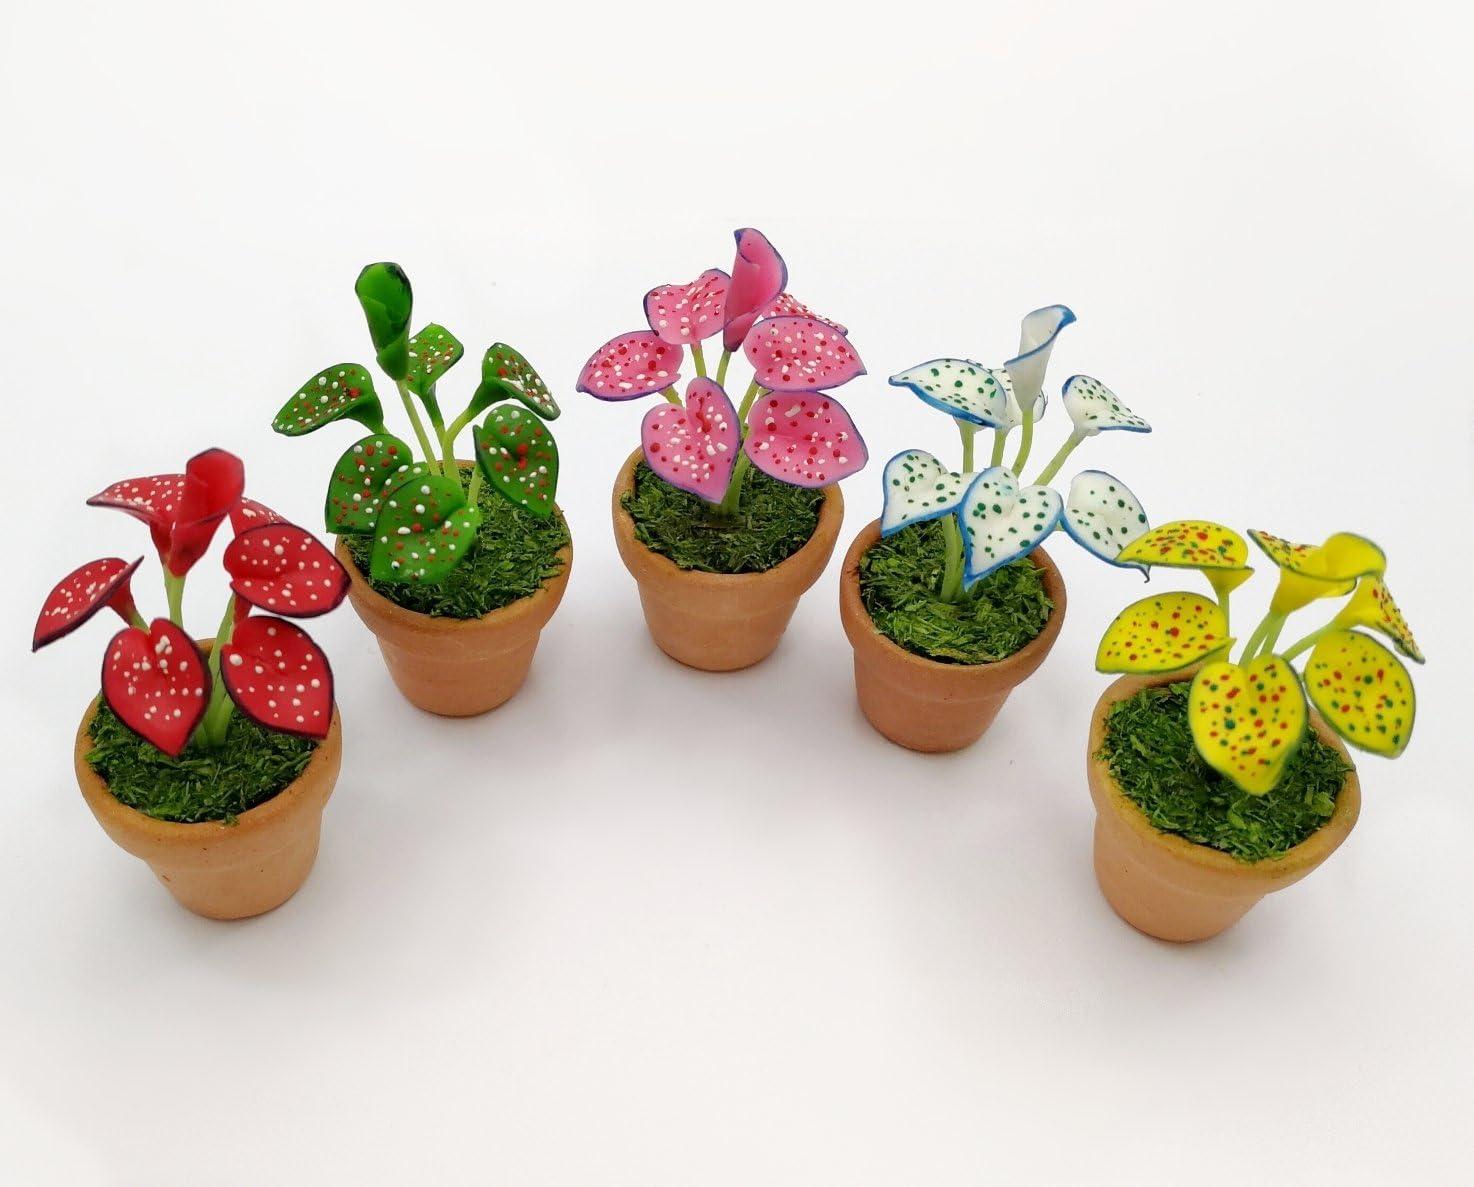 Red Leaved Caladium Flower Miniature Handmade Clay Plant Dollhouse Accessory